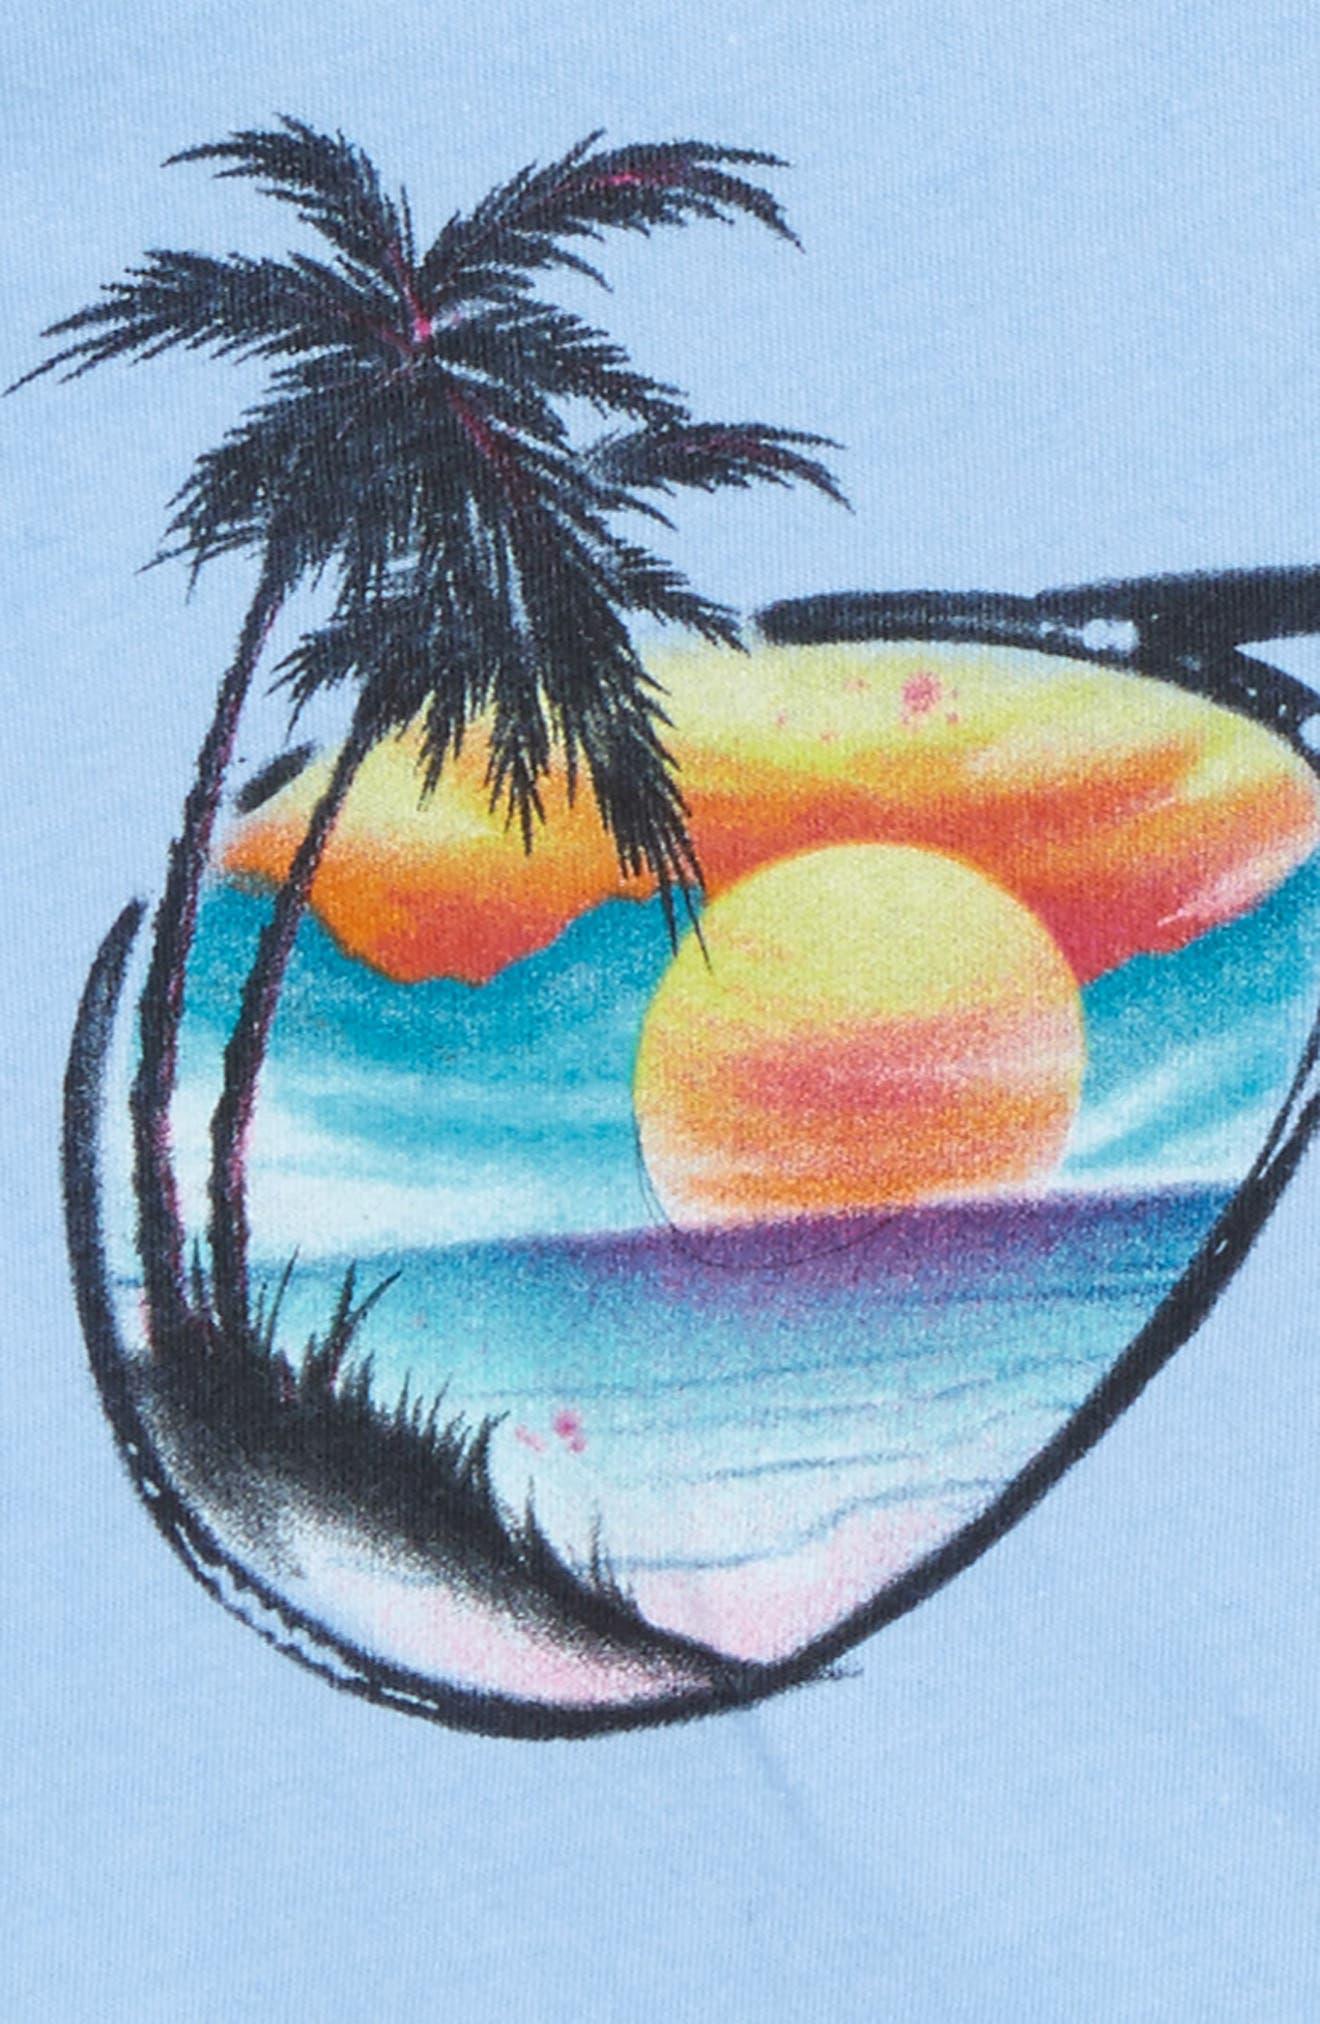 Shades Ruffle Tank,                             Alternate thumbnail 2, color,                             Bleached Denim